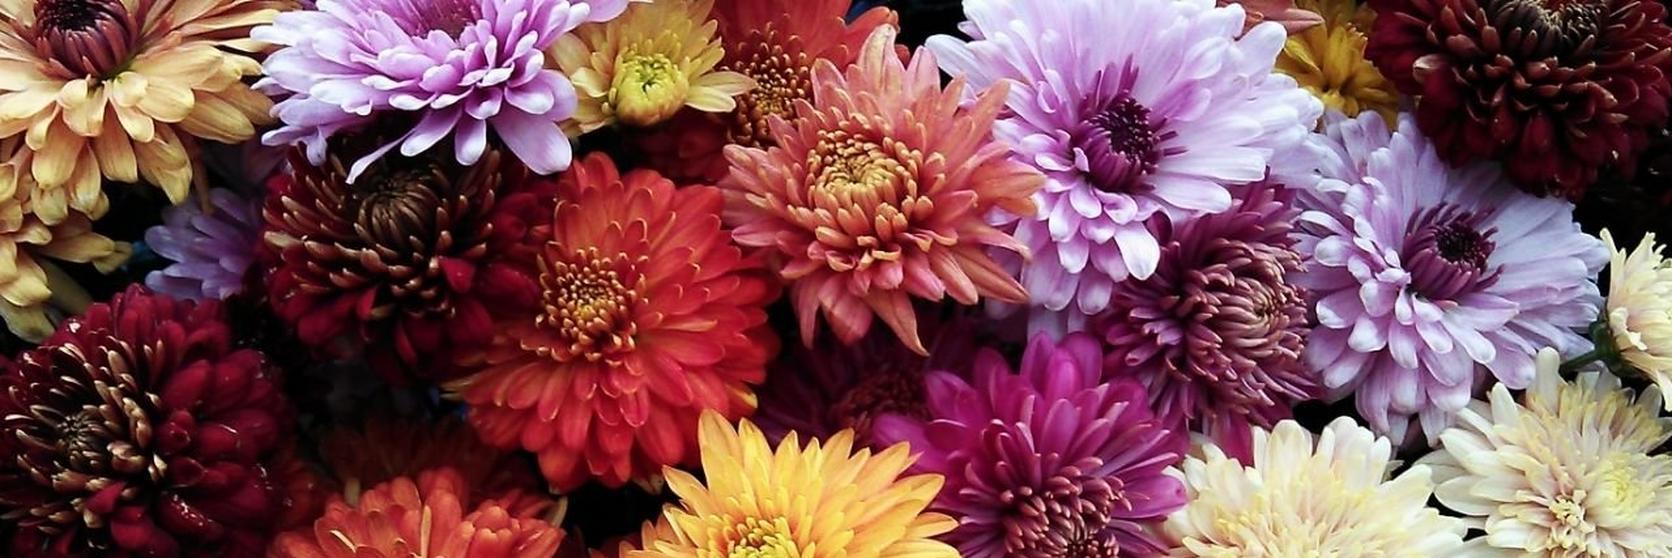 Chrysanthemum-group